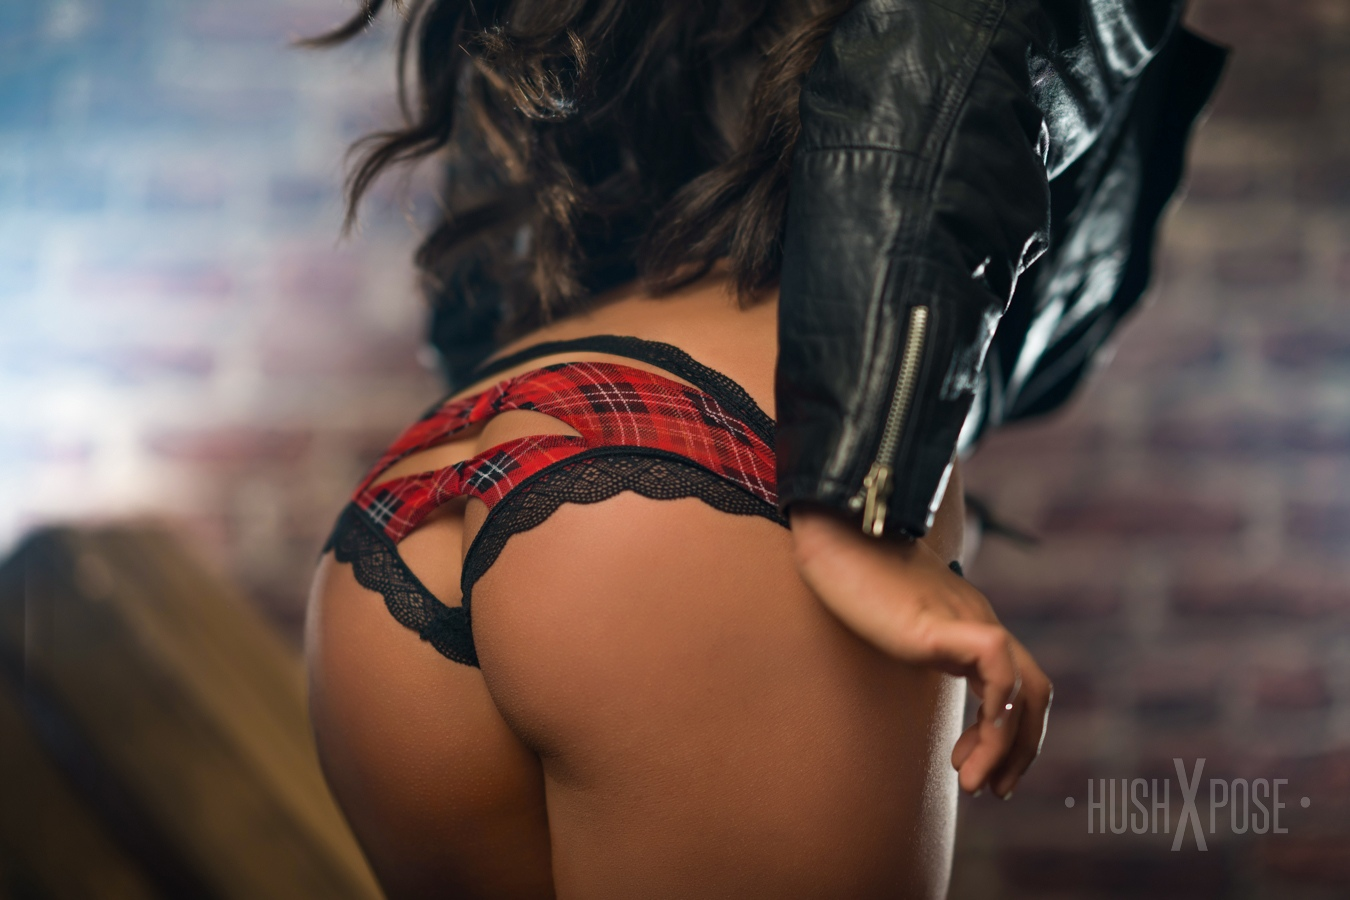 best boudoir booty shots image